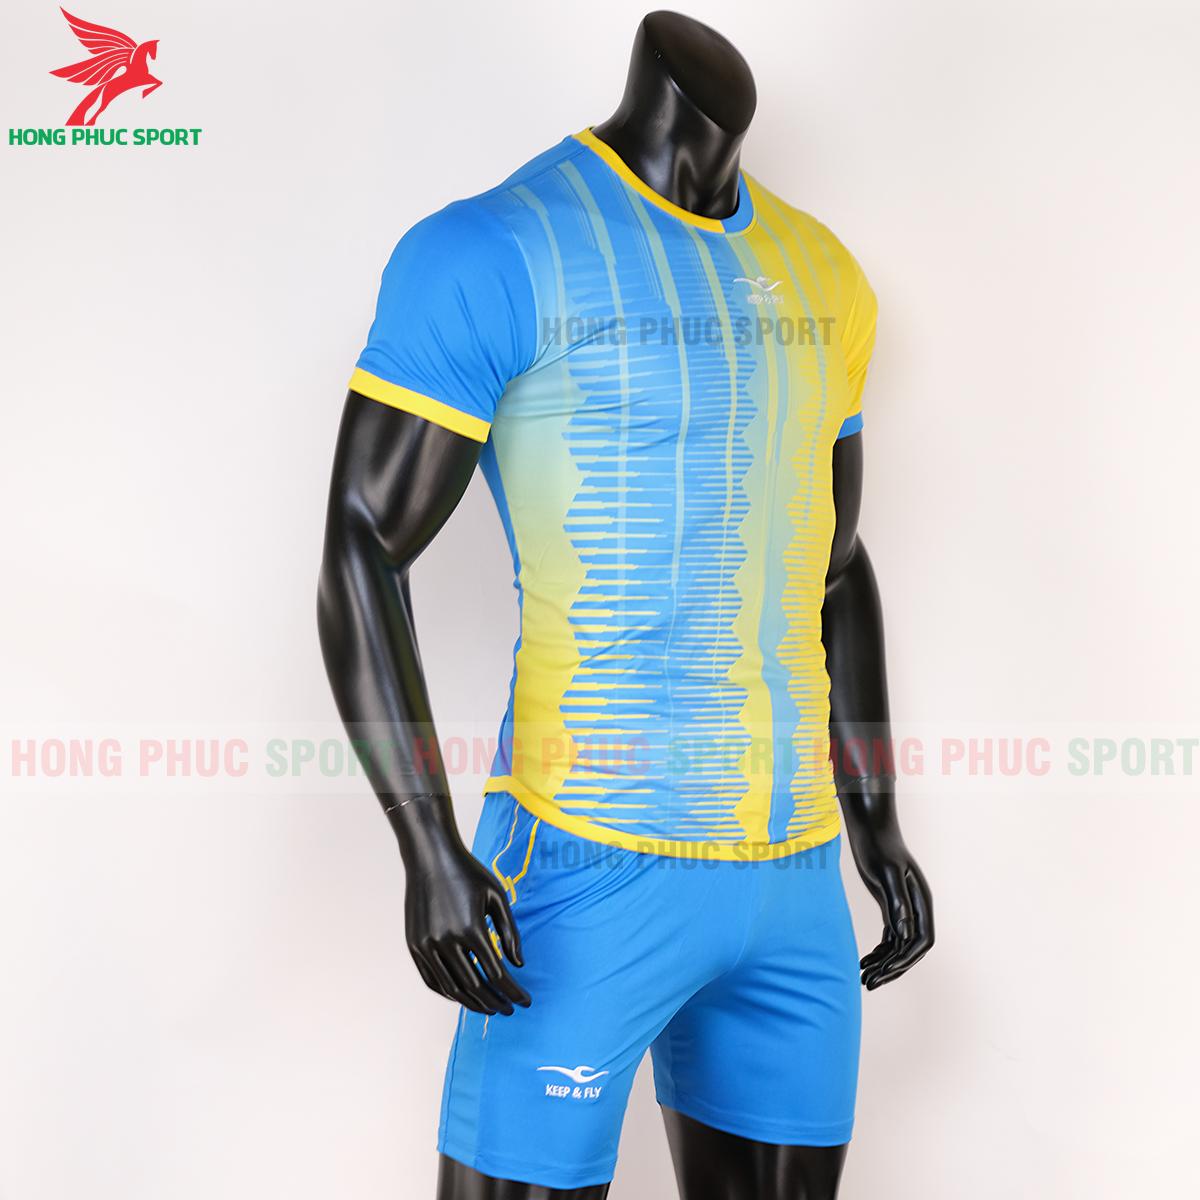 https://cdn.hongphucsport.com/unsafe/s4.shopbay.vn/files/285/ao-bong-da-keep-fly-razy-vang-xanh-phai-5f719a35ab548.png